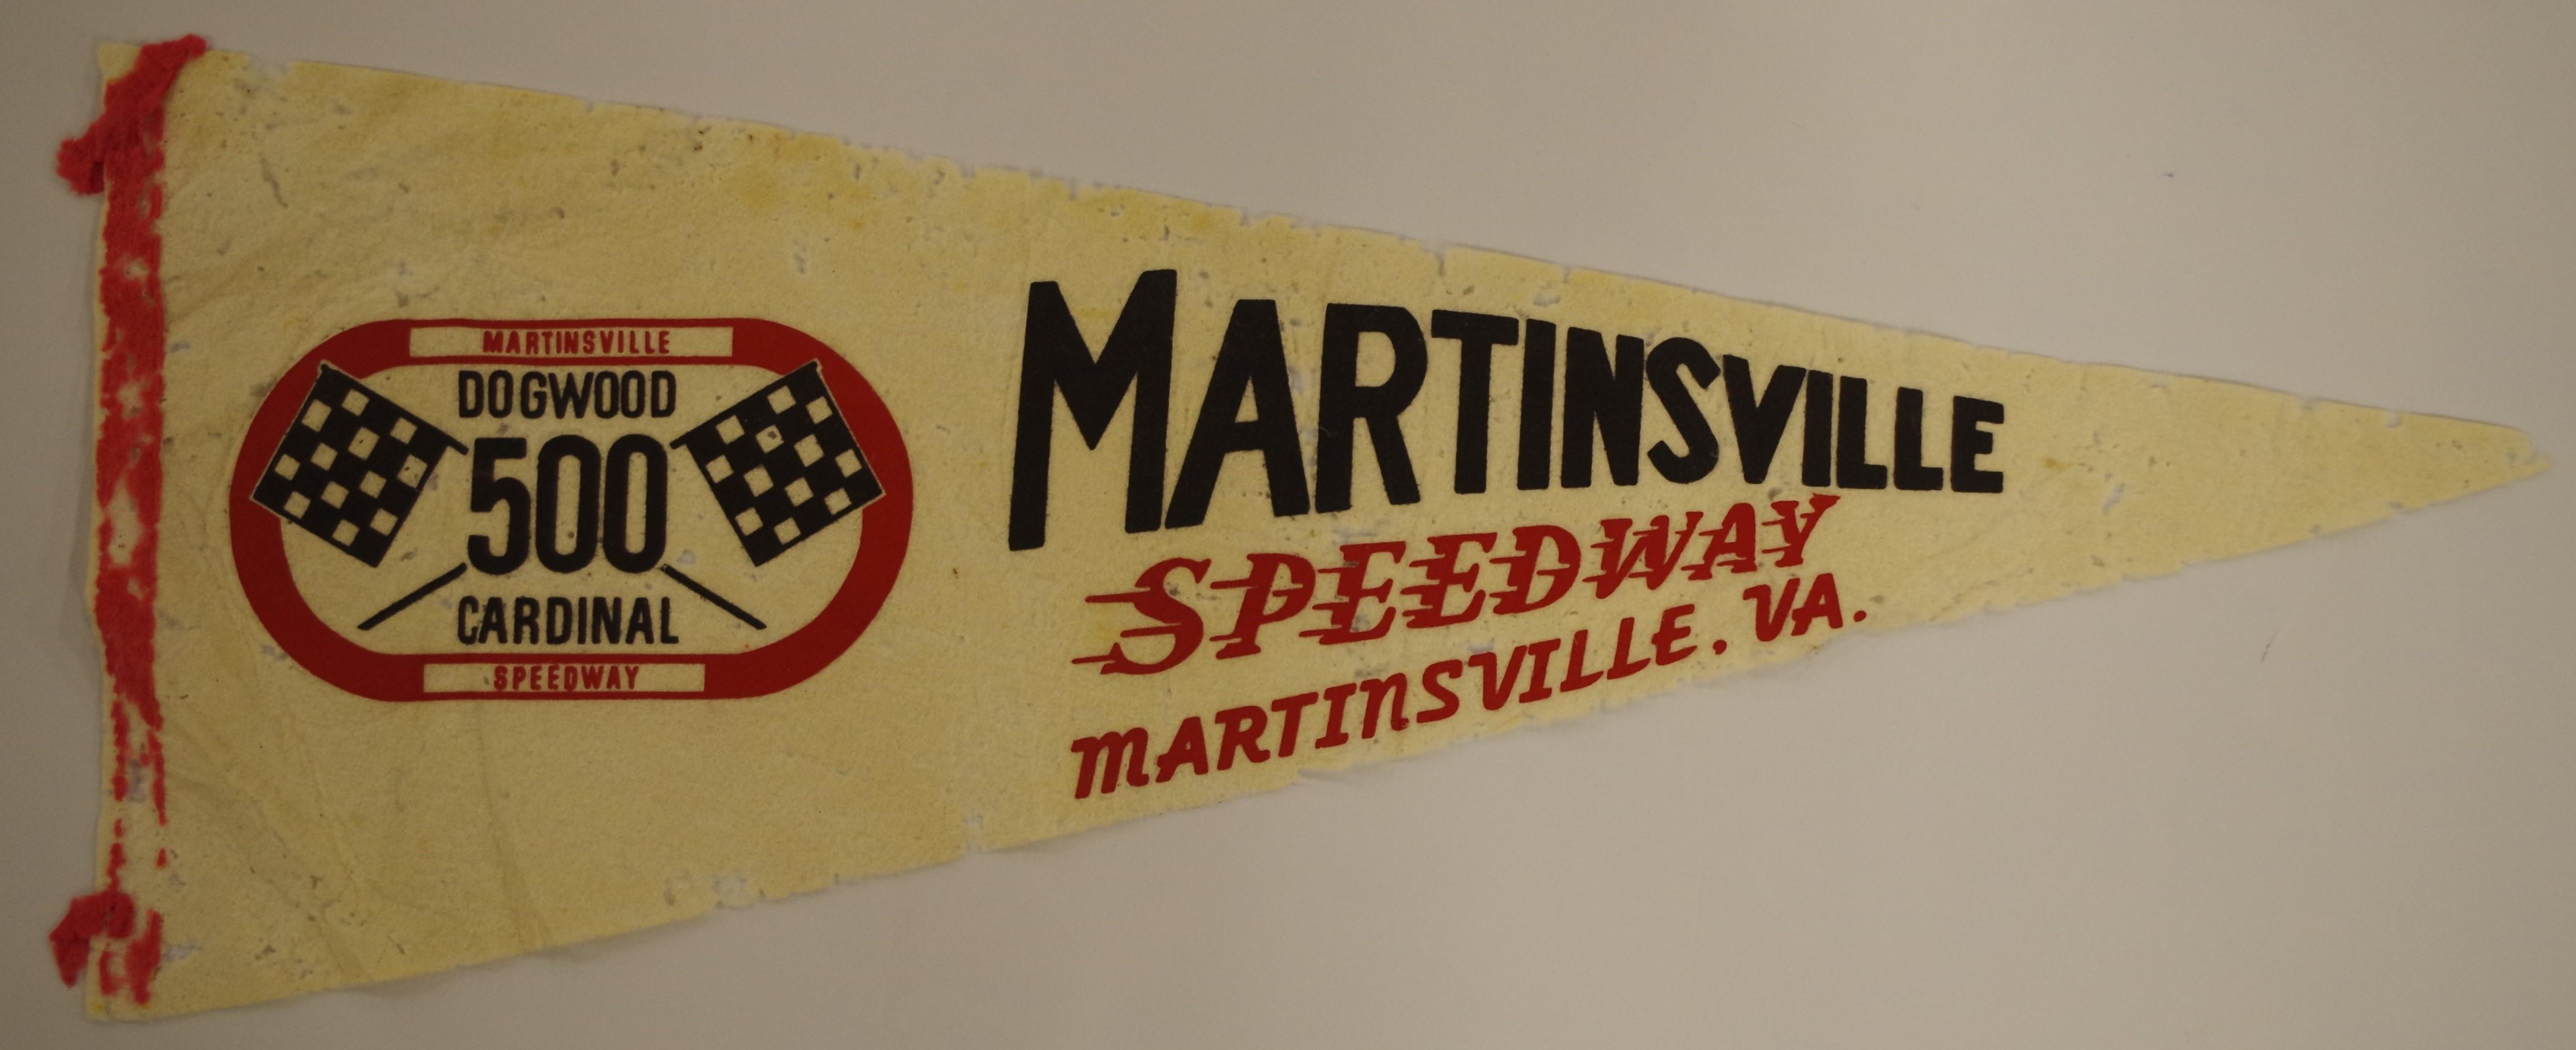 Artifact: Martinsville Speedway Pennant